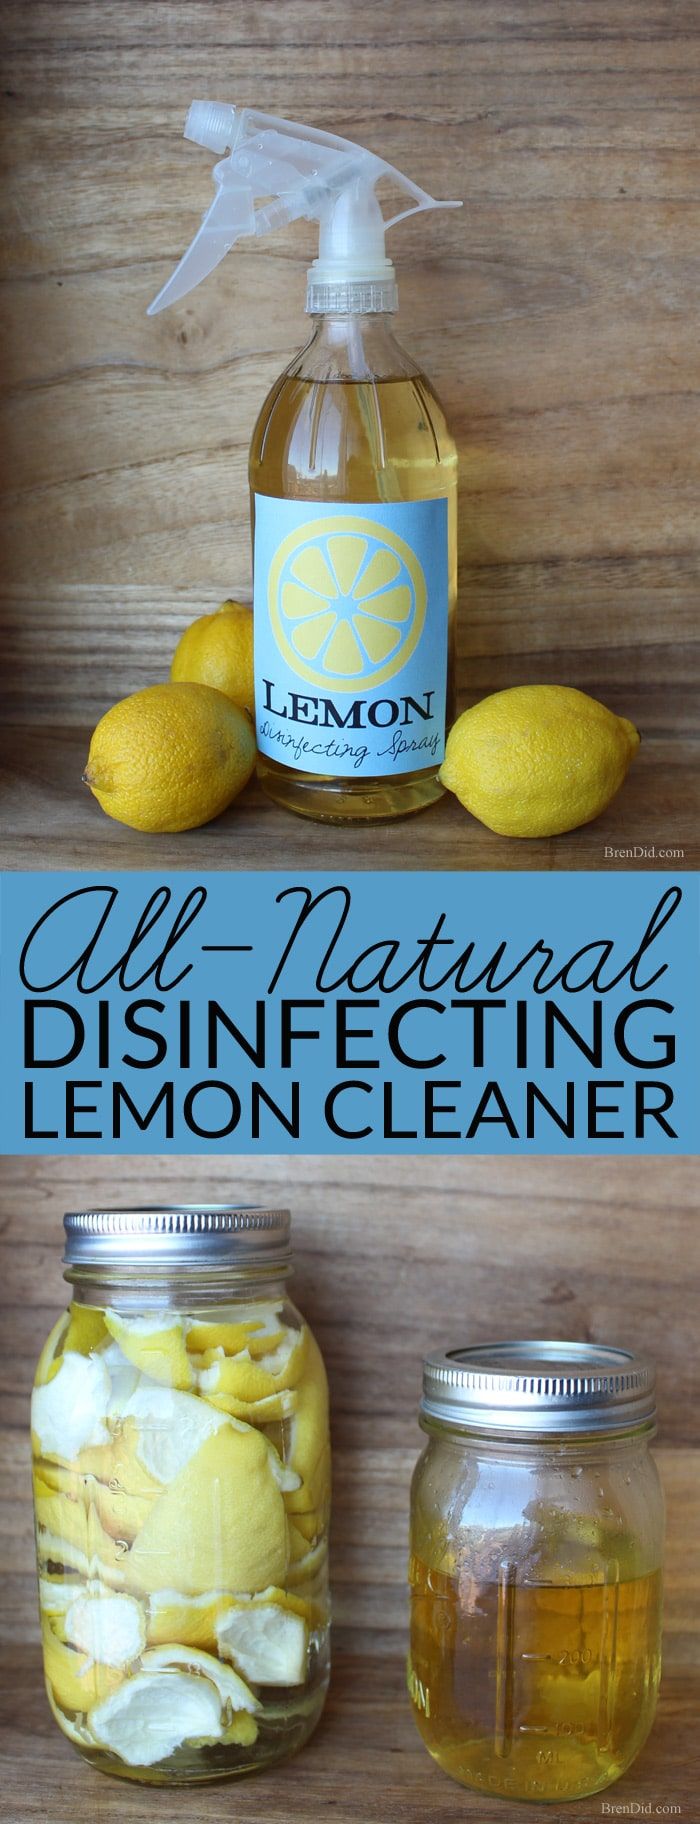 Lemon Infused Disinfectant Spray Cleaner - Bren Did